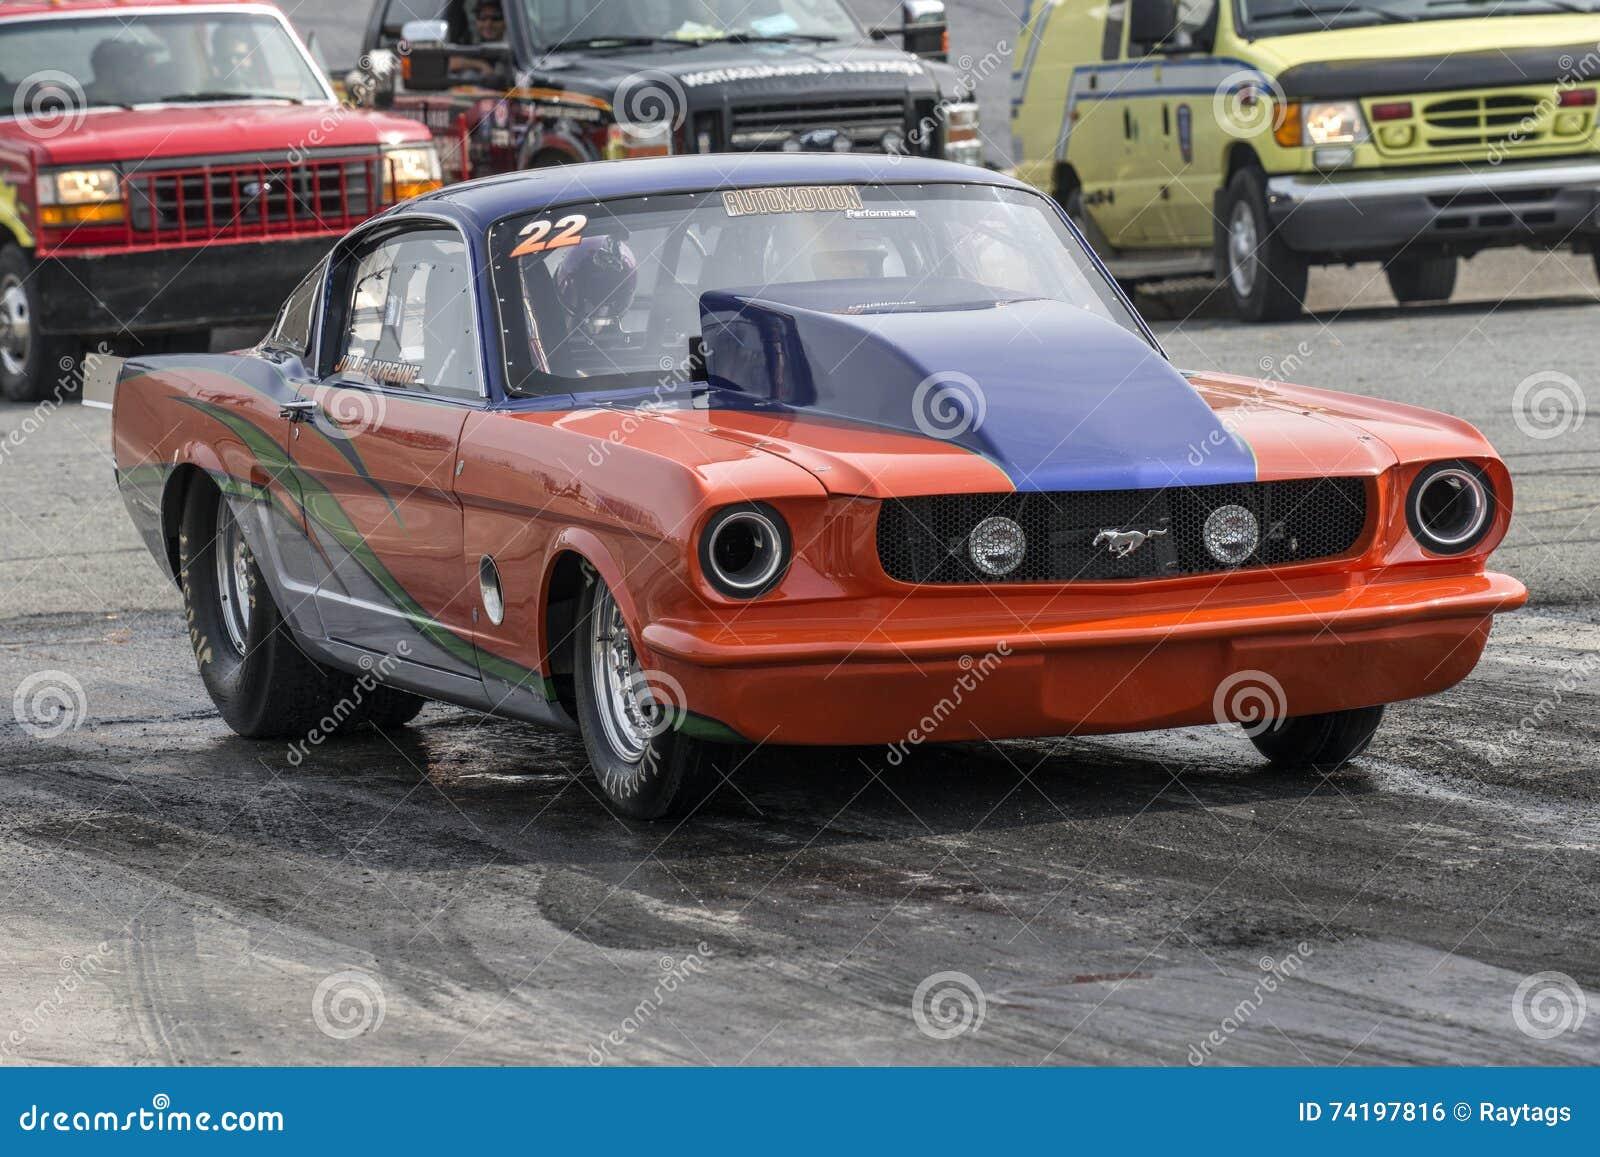 Vintage mustang drag car